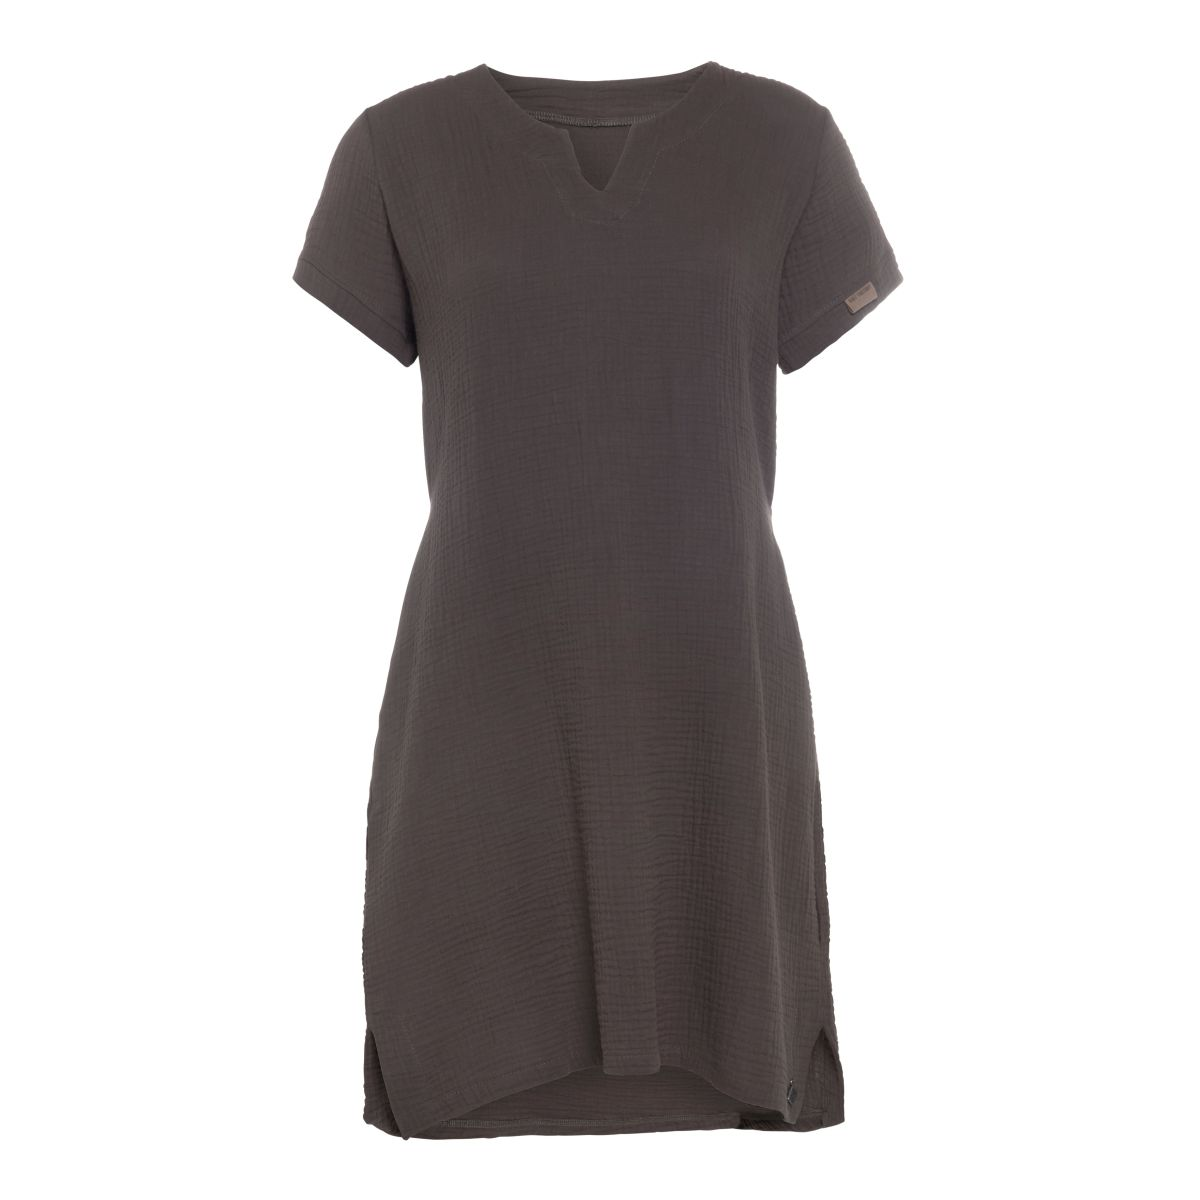 knit factory kf15012001050 indy jurk antraciet m 1